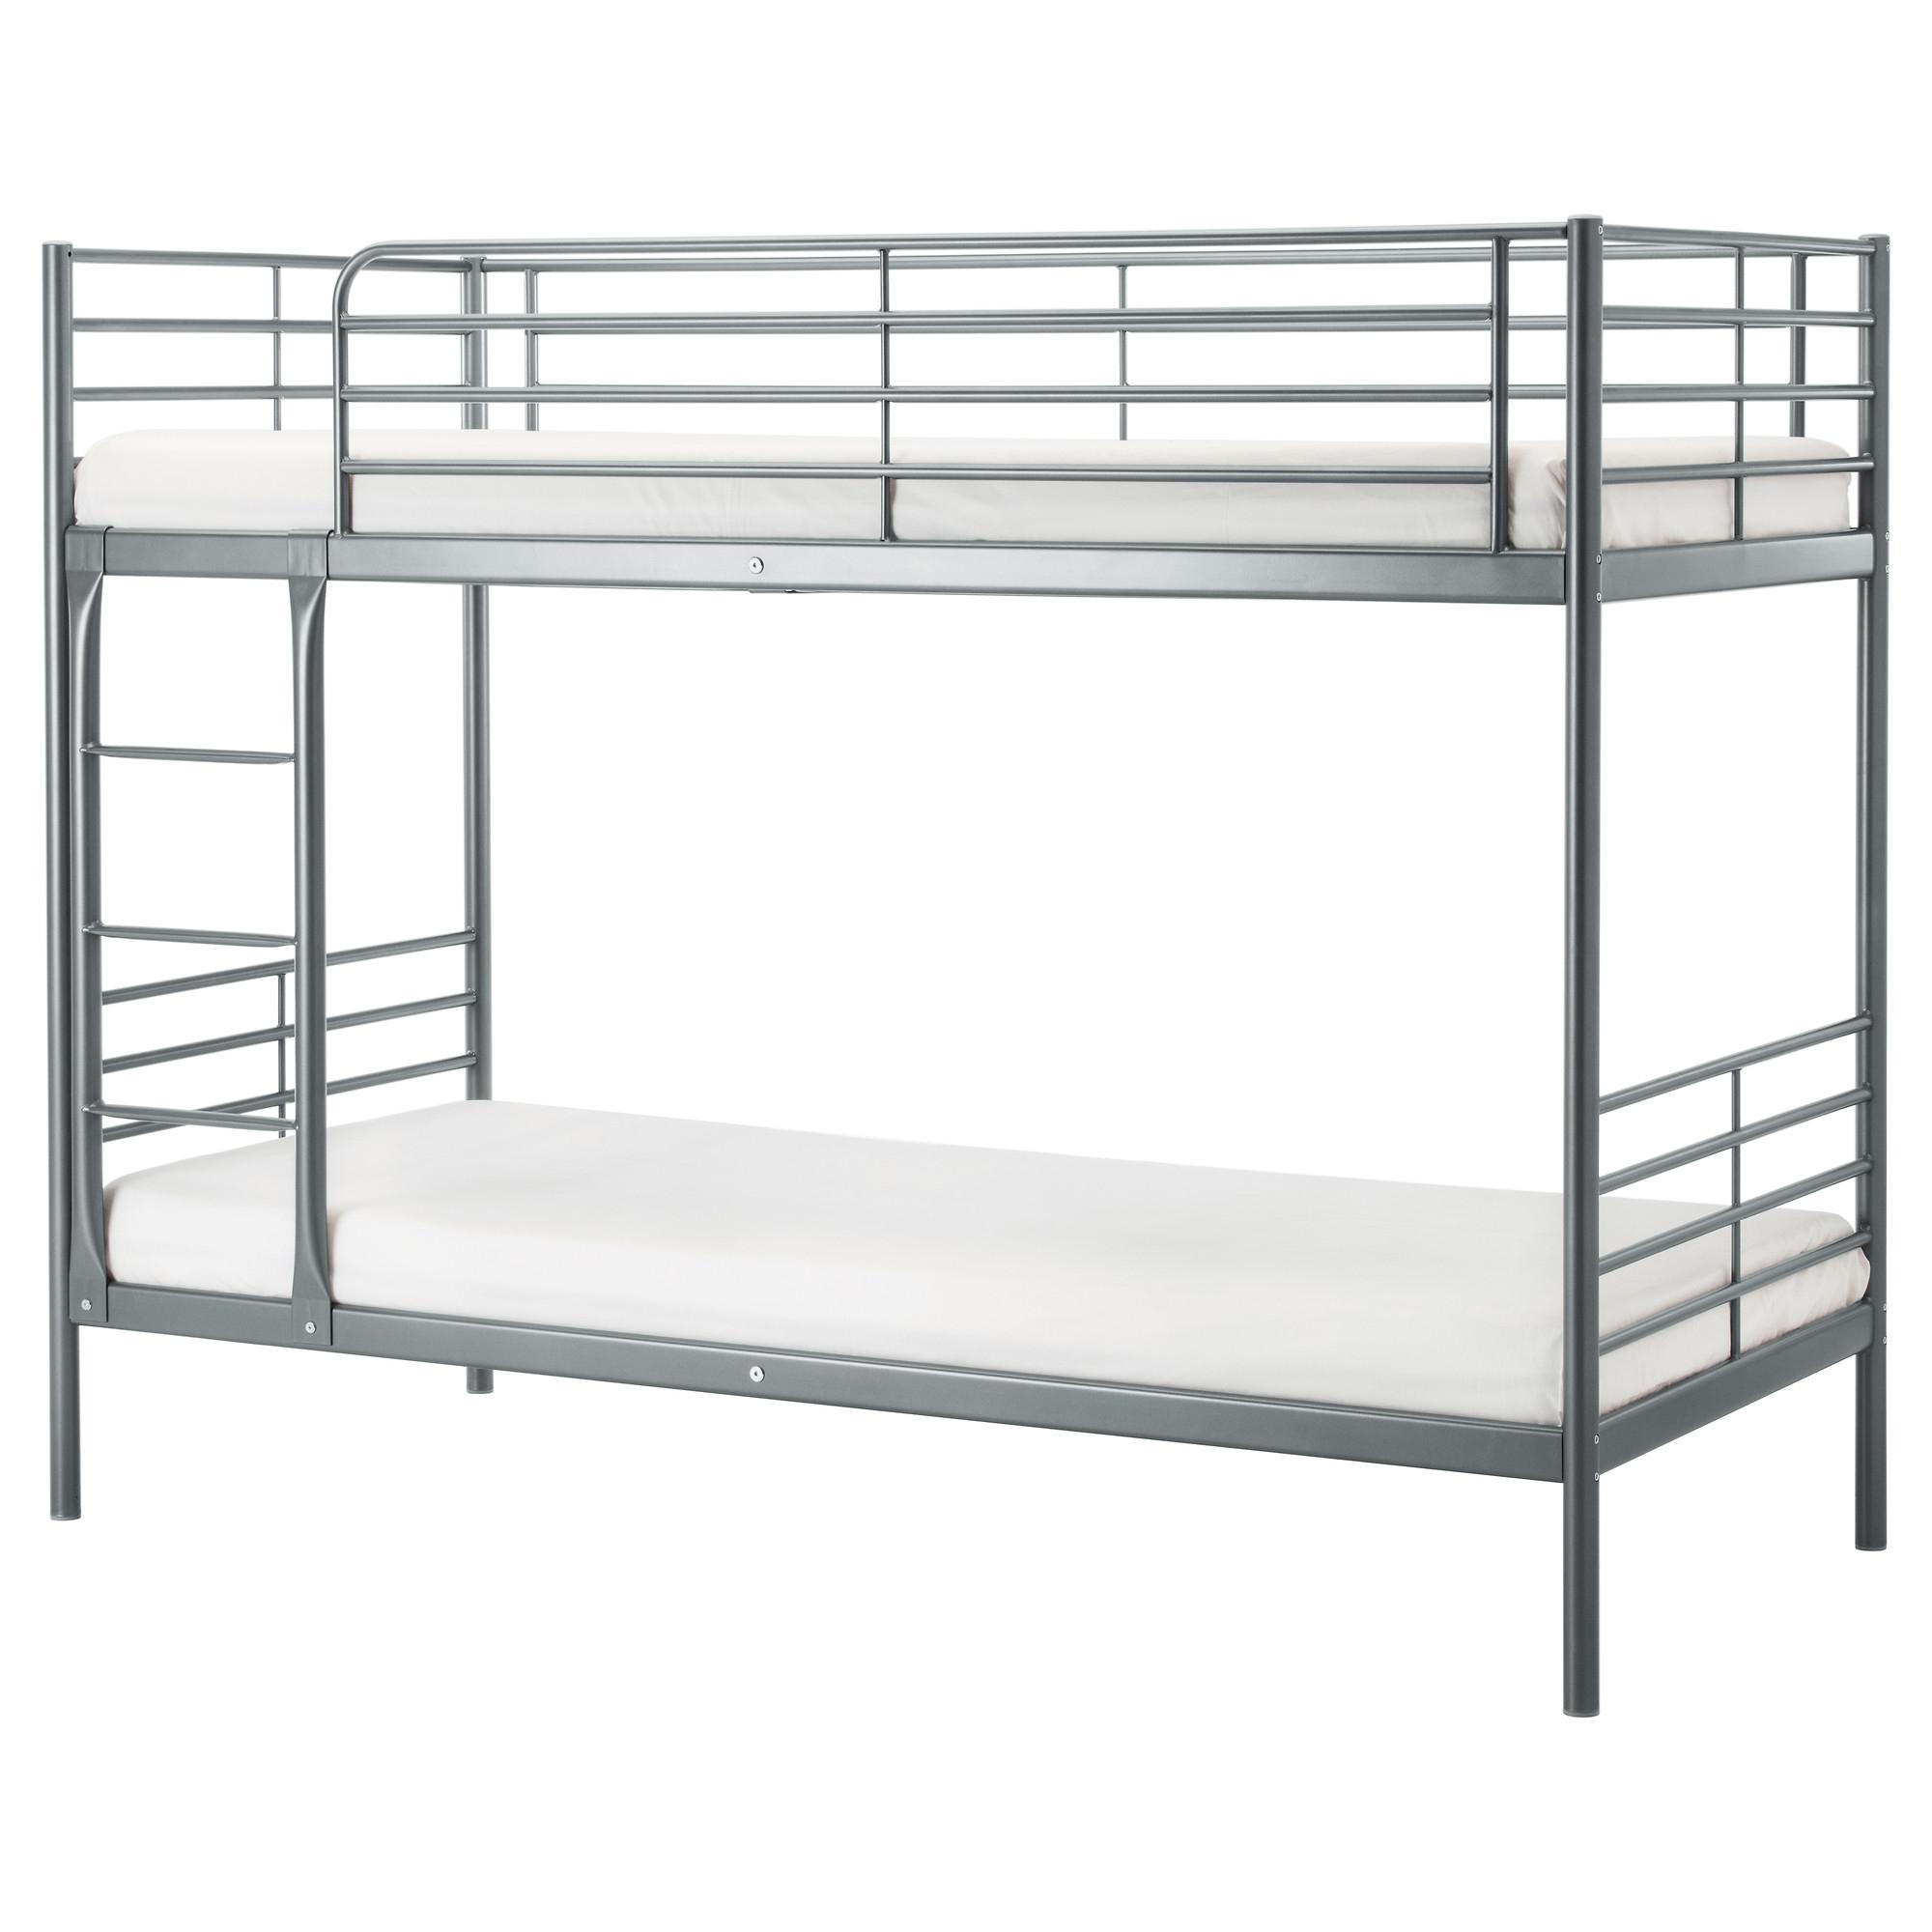 surprising Ikea Grey Bunk Bed Part - 1: SVÄRTA bunk bed frame